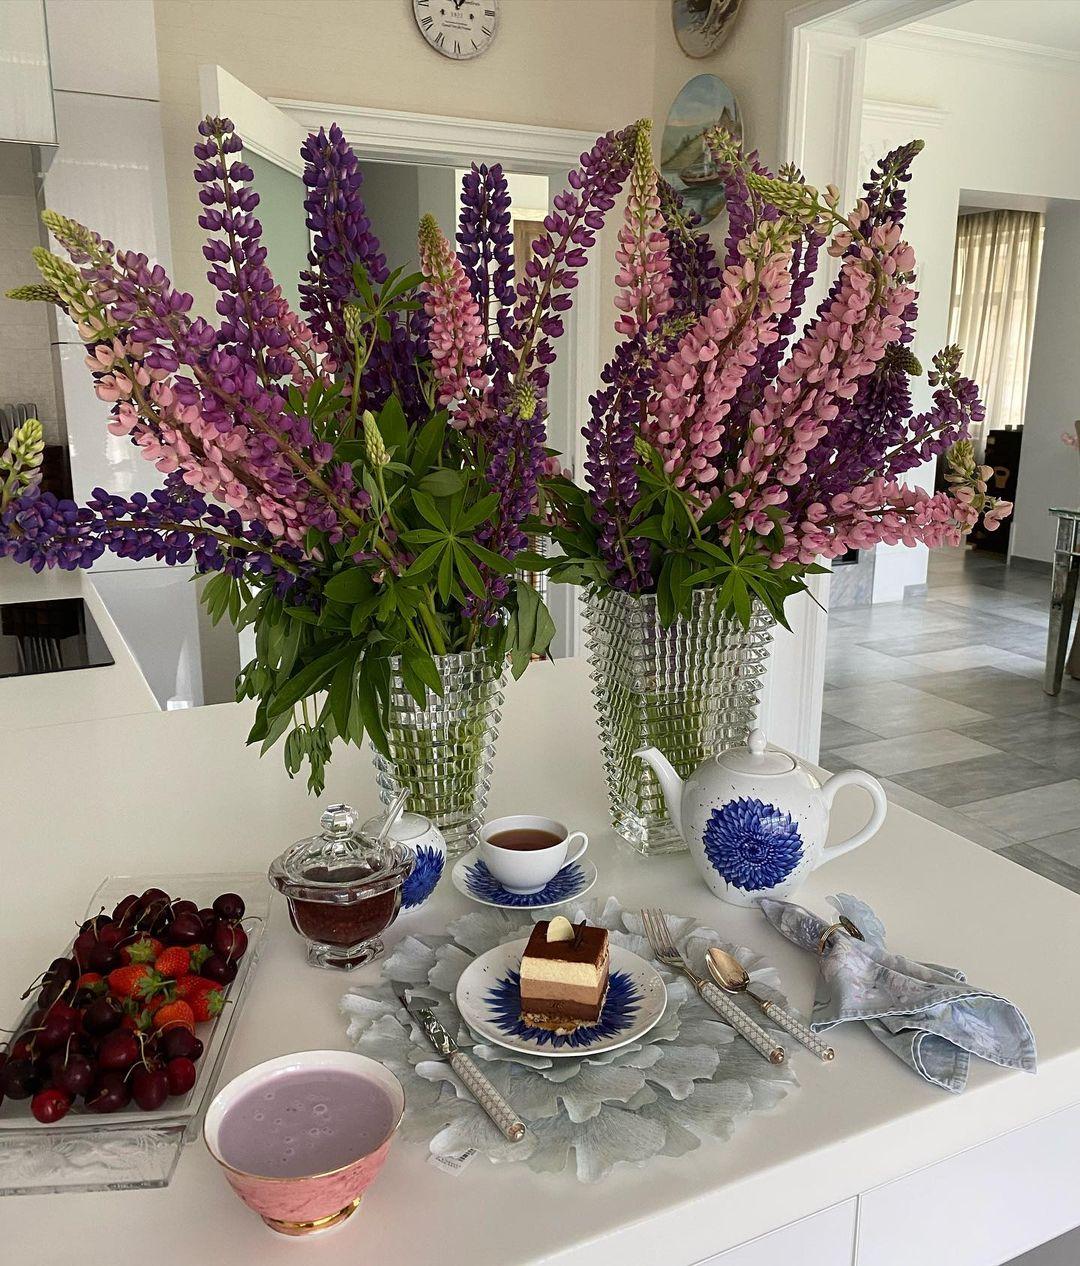 Люпины, букет, Цветы, Завтраки Яны Рудковской